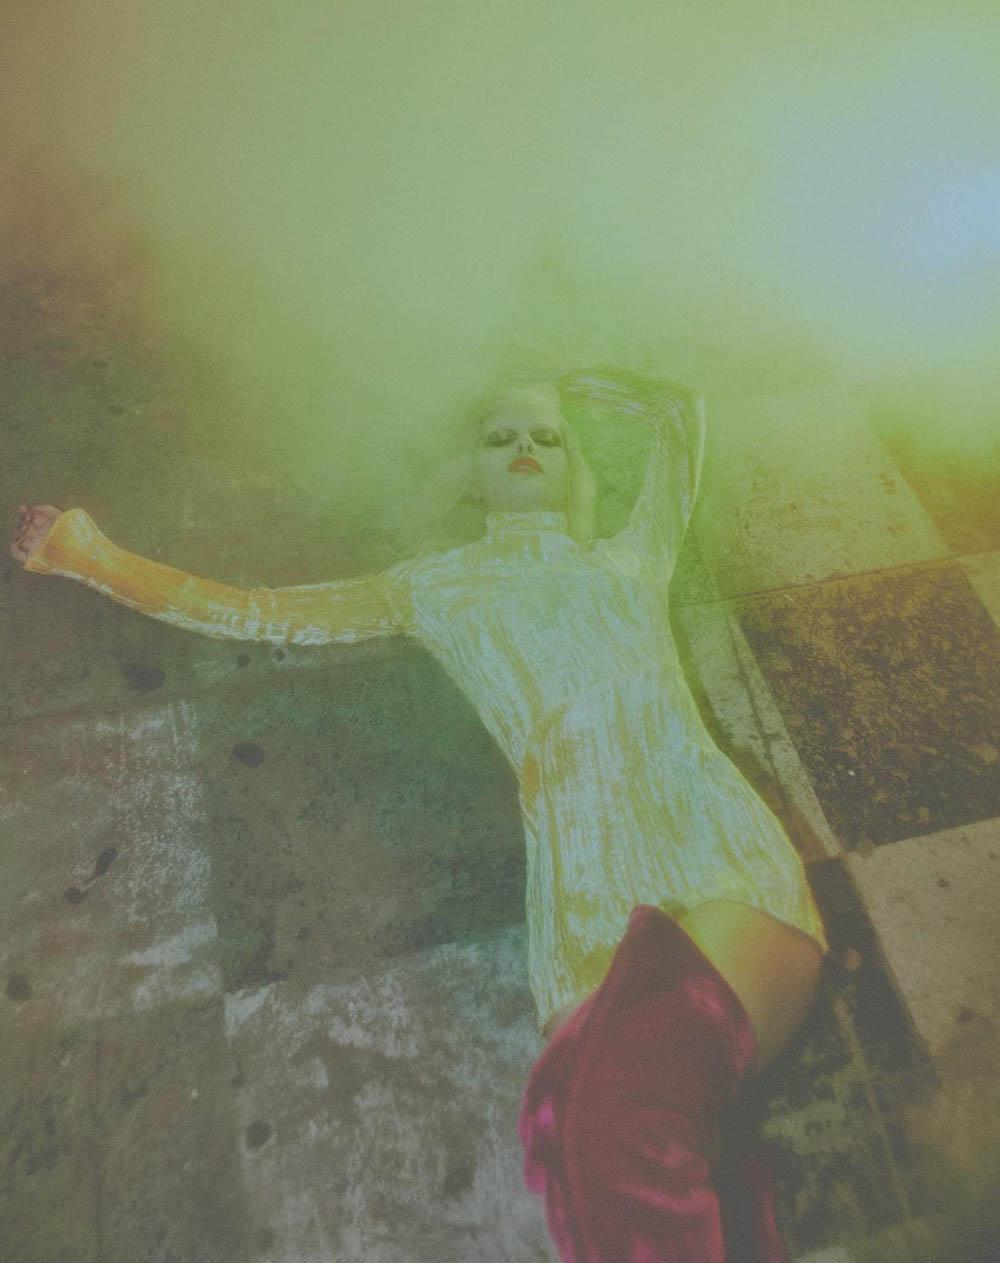 Elise Agee by Emmanuel Giraud for Numéro April 2018